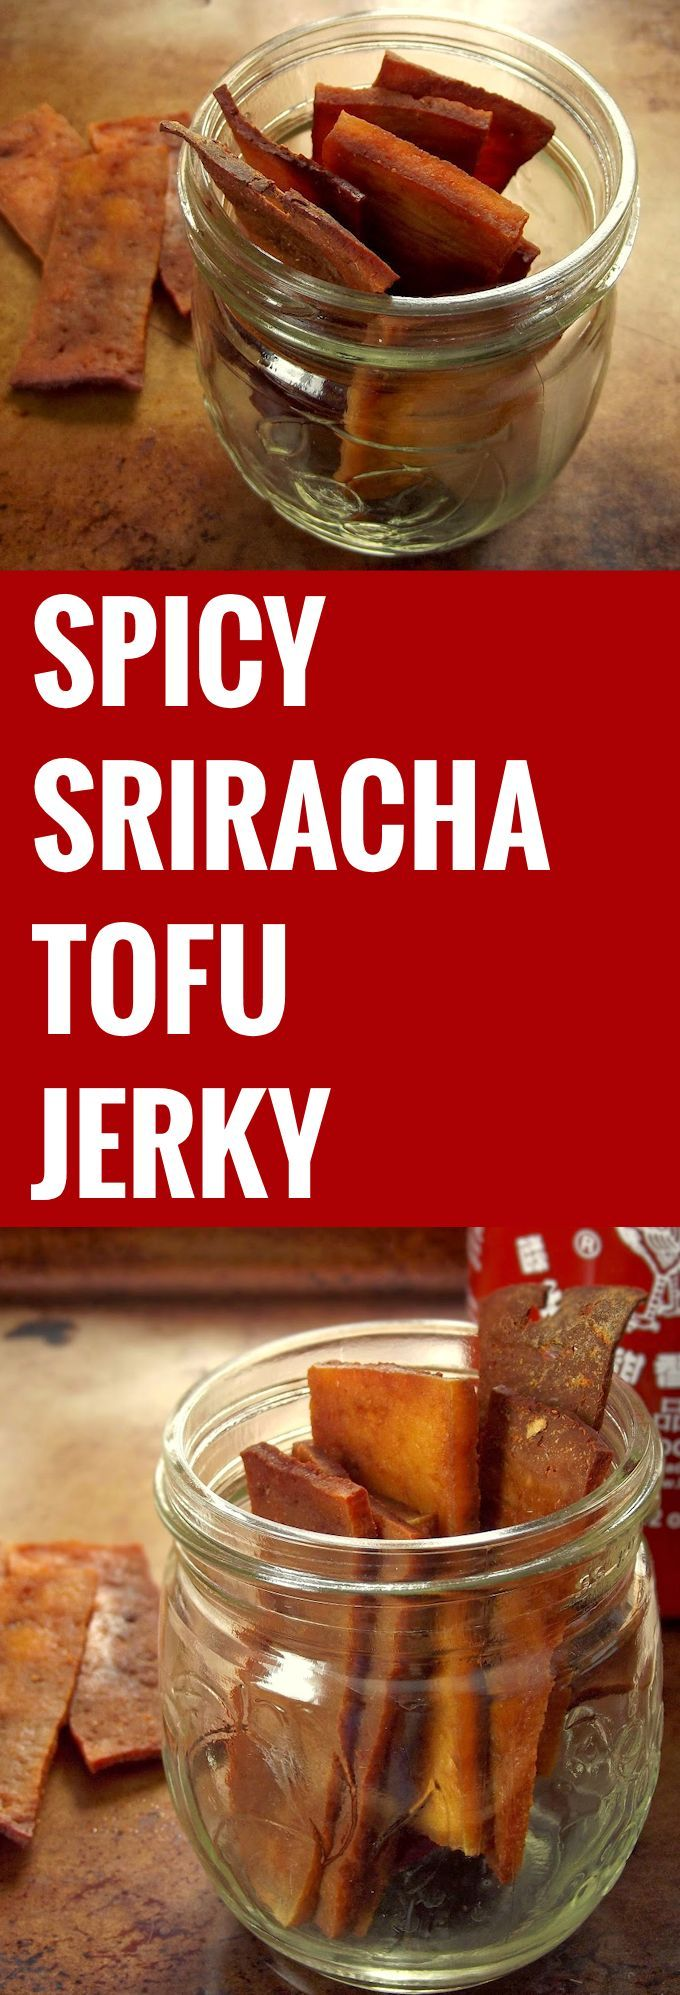 Spicy Sriracha Tofu Jerky